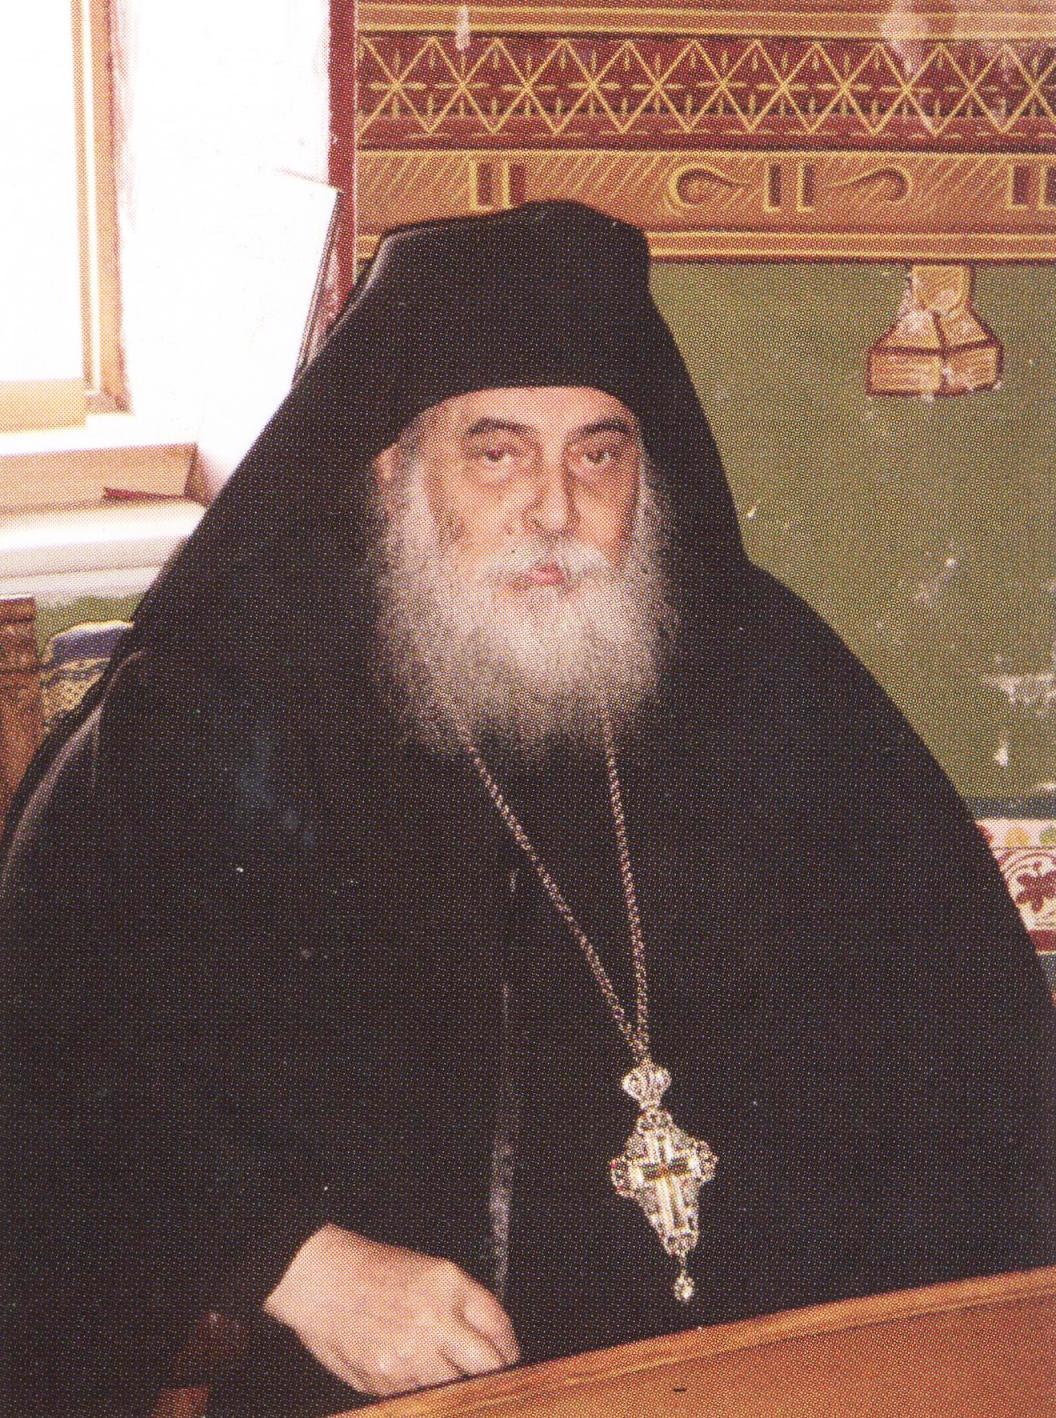 http://www.diakonima.gr/wp-content/uploads/2009/09/gerontas-georgios-kapsanis.jpg